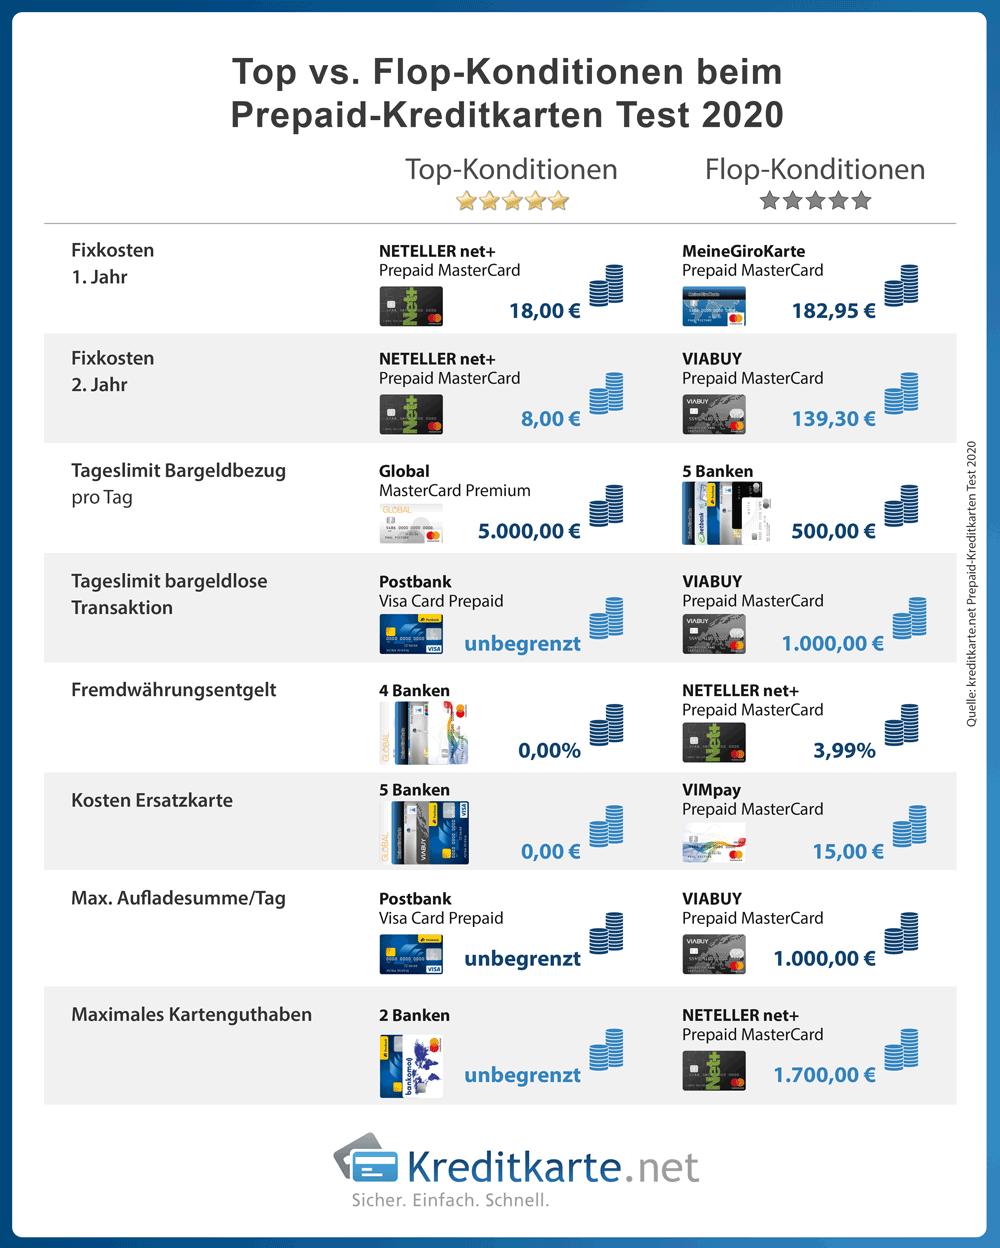 infografik-prepaidkreditkarten-test-top-flop-konditionen